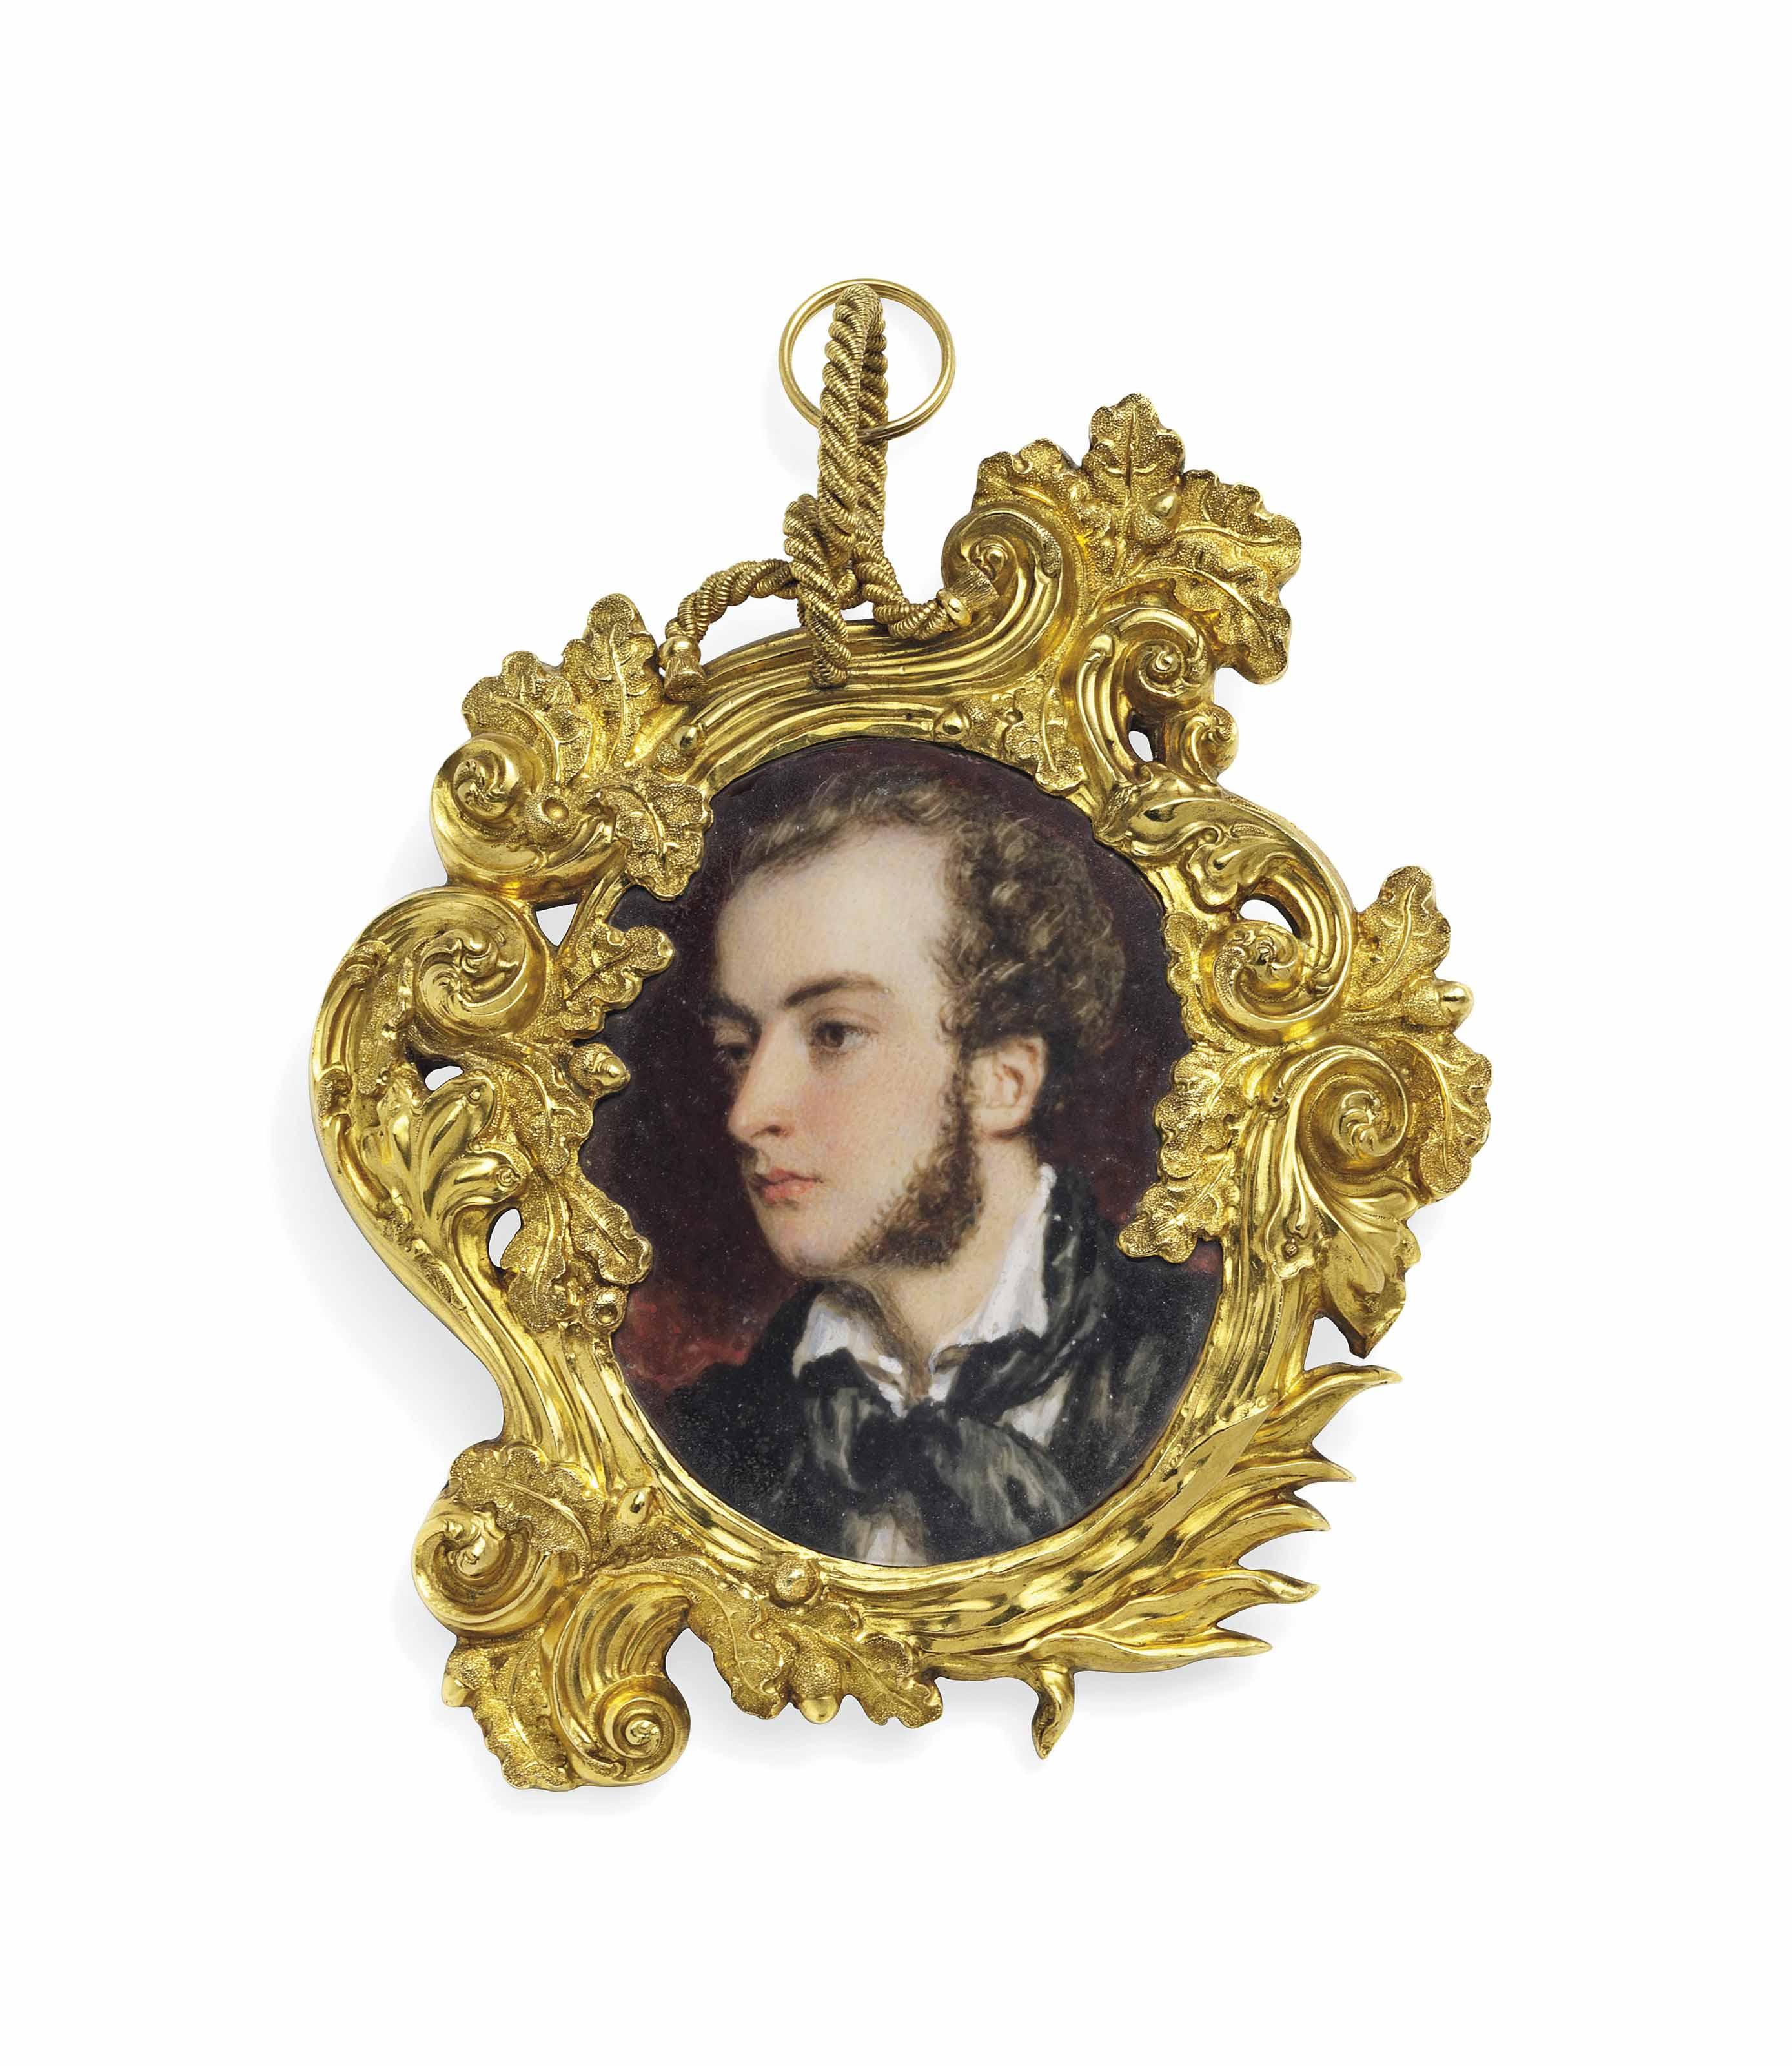 SIMON JACQUES ROCHARD (ANGLO-FRENCH, 1788-1872)